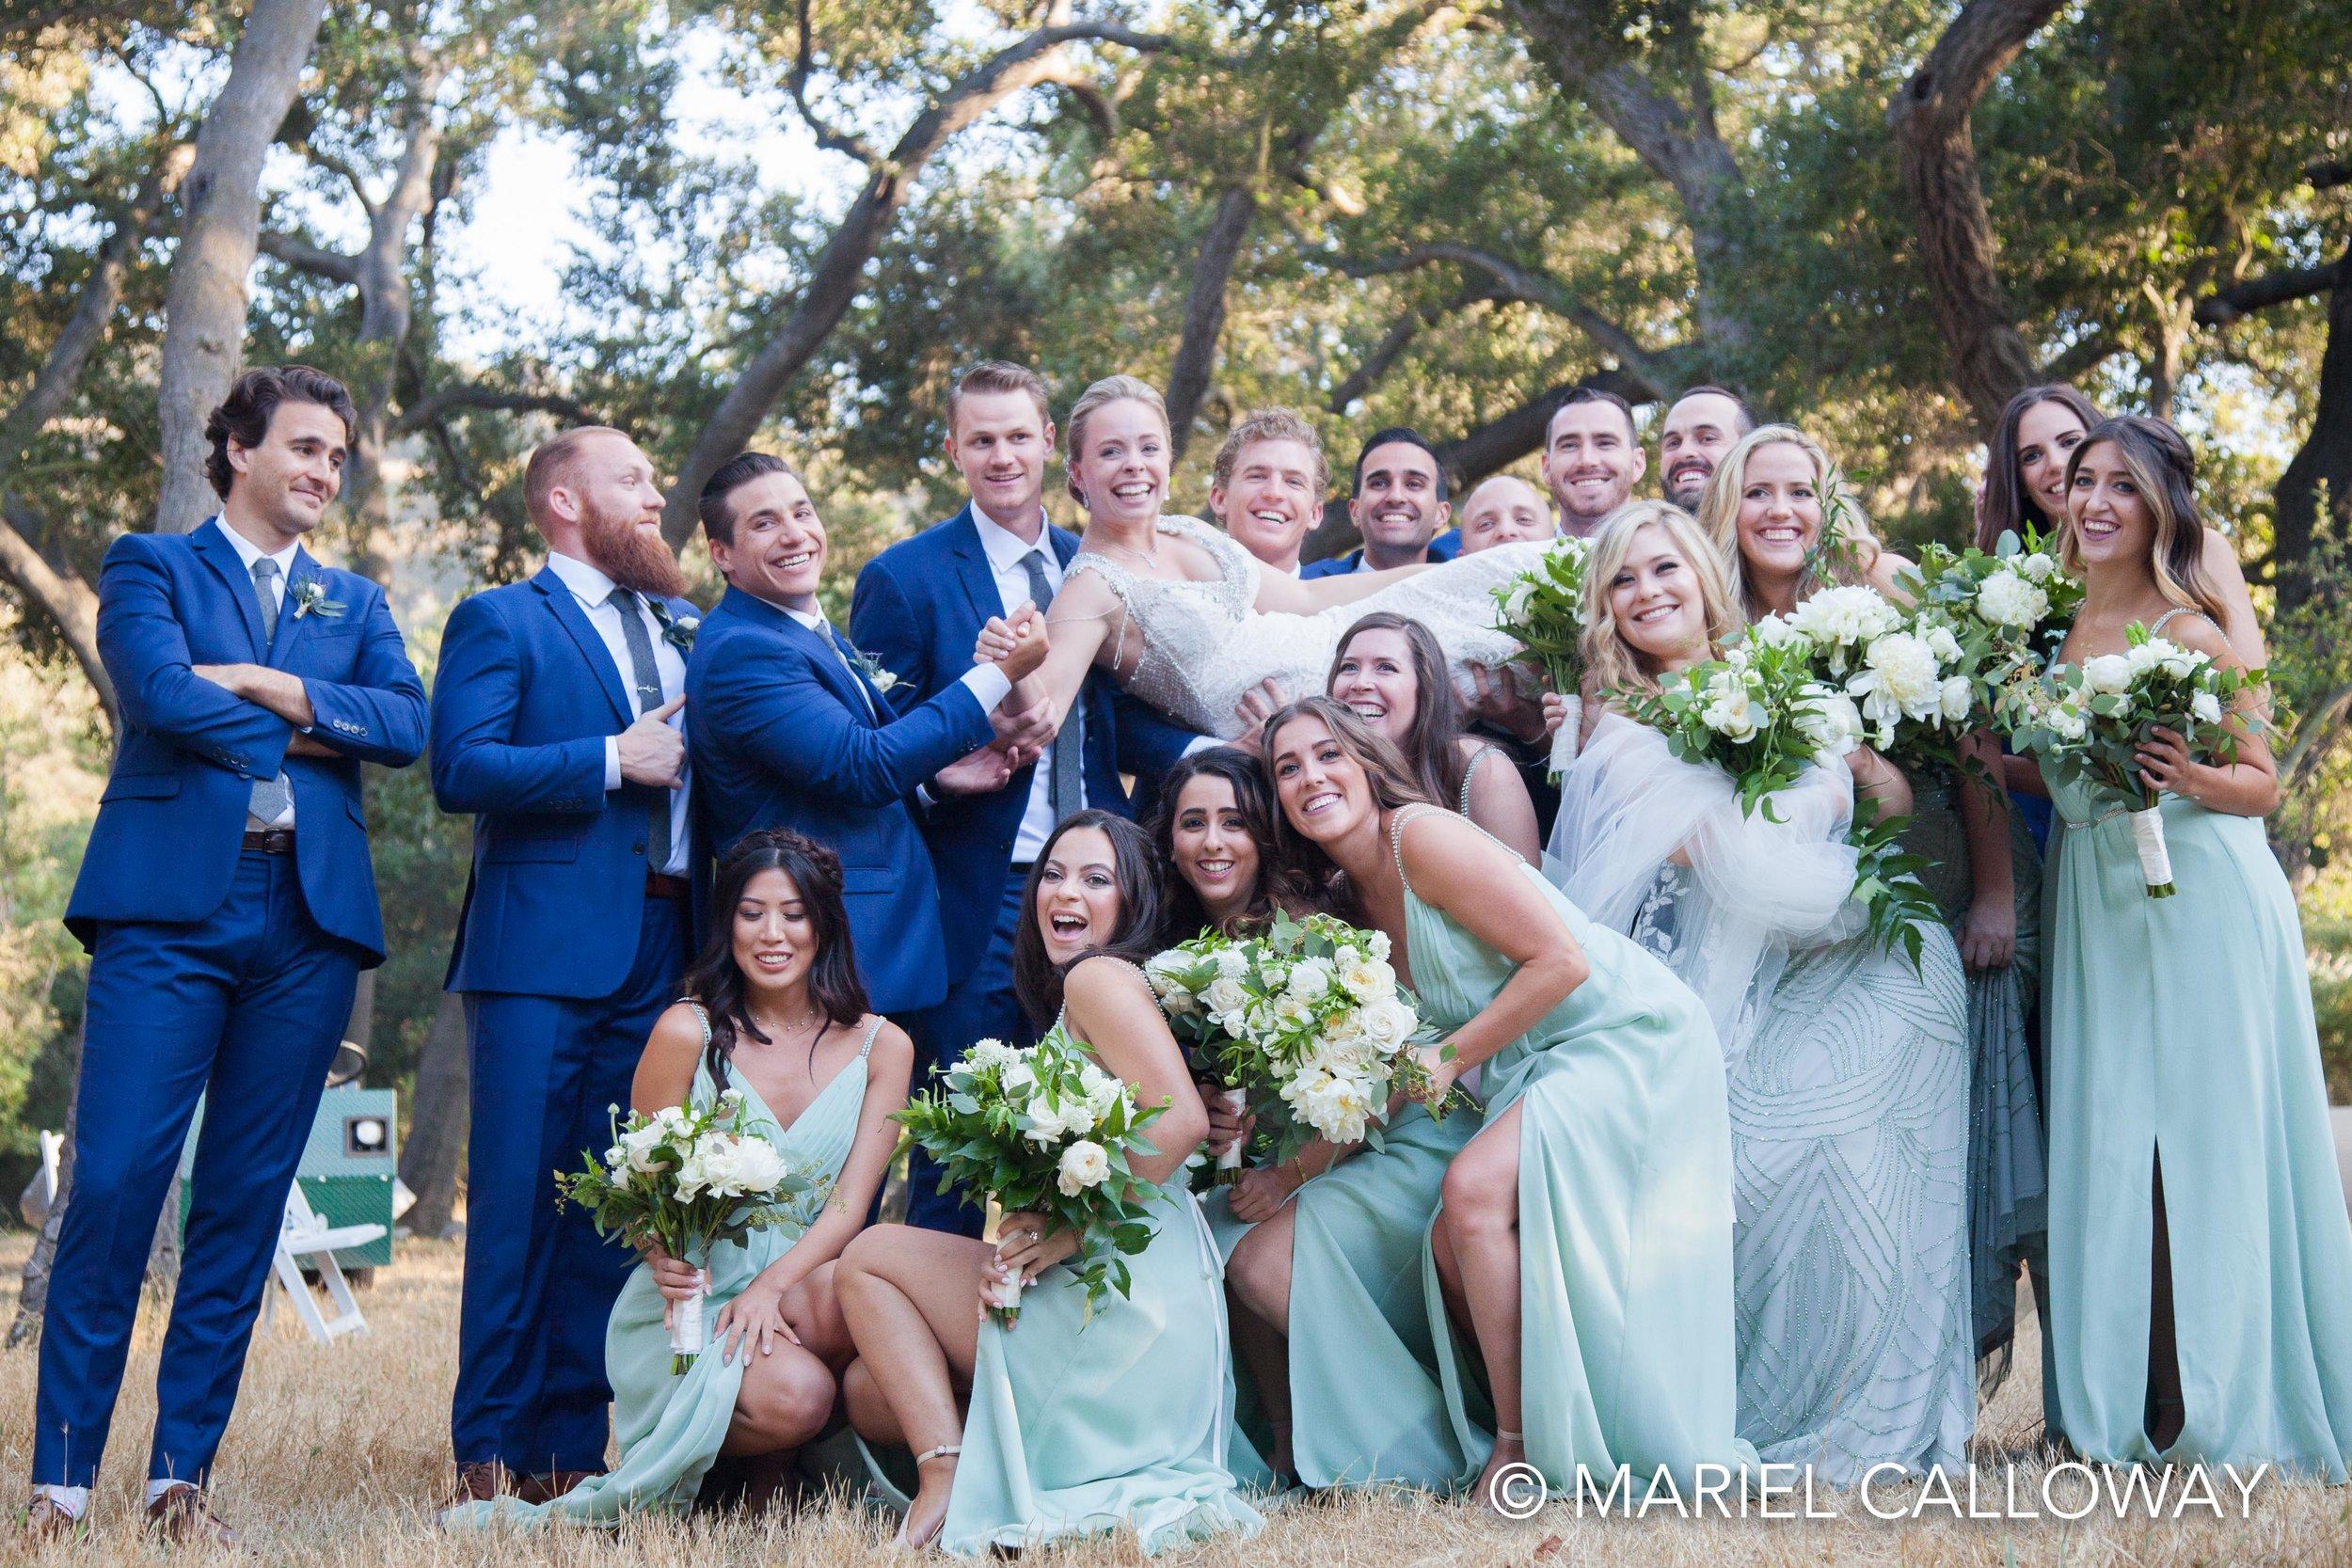 Mariel-Calloway-Los-Angeles-Wedding-Photography-Smith-35.jpg